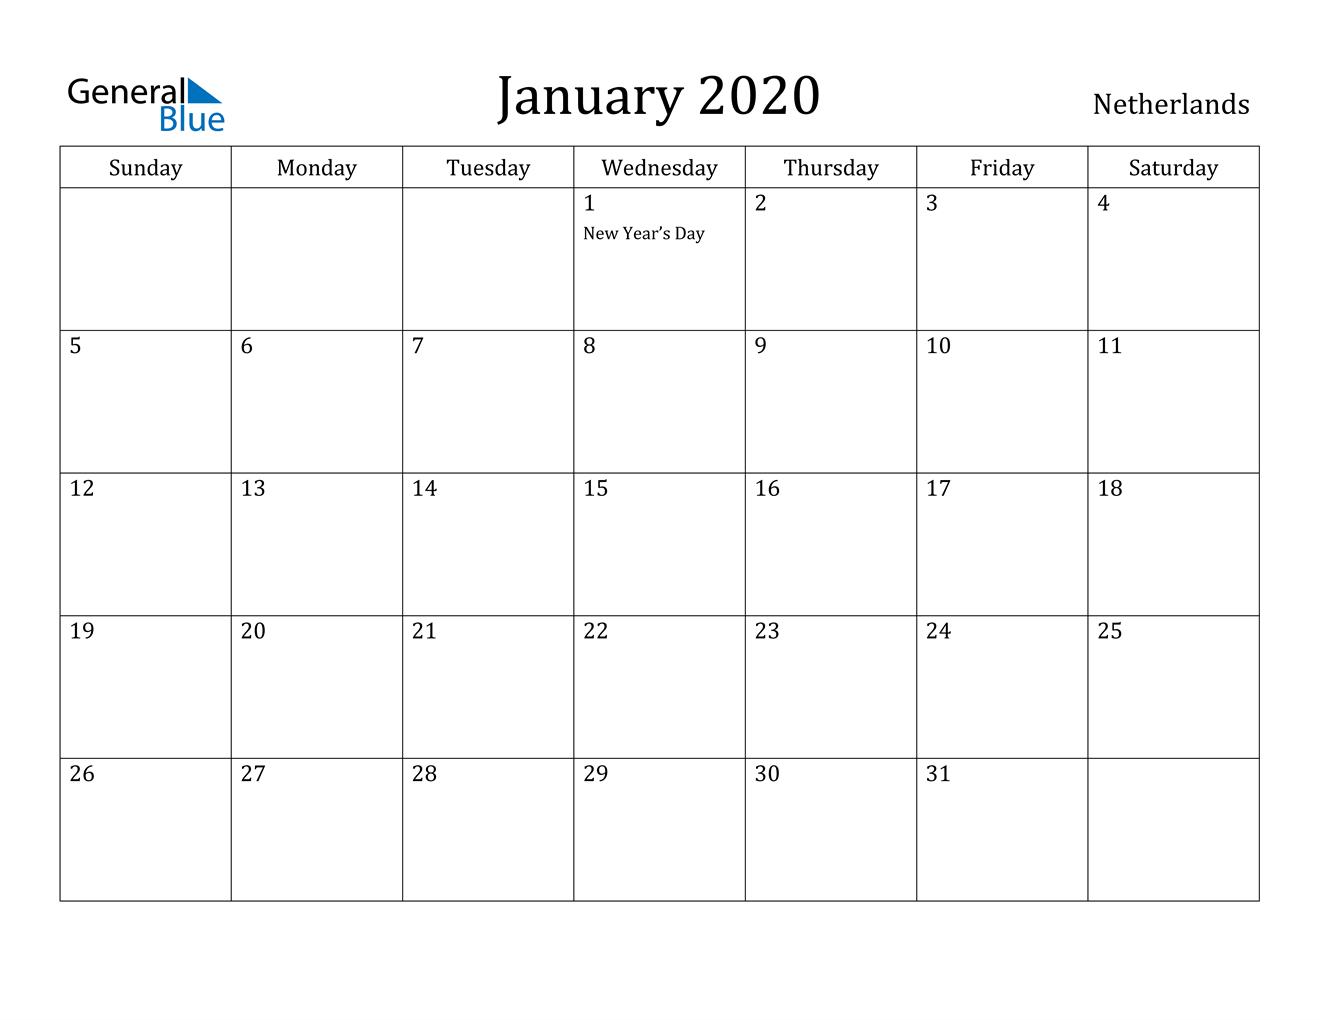 January 2020 Calendar - Netherlands within Calendar 2020 Nl